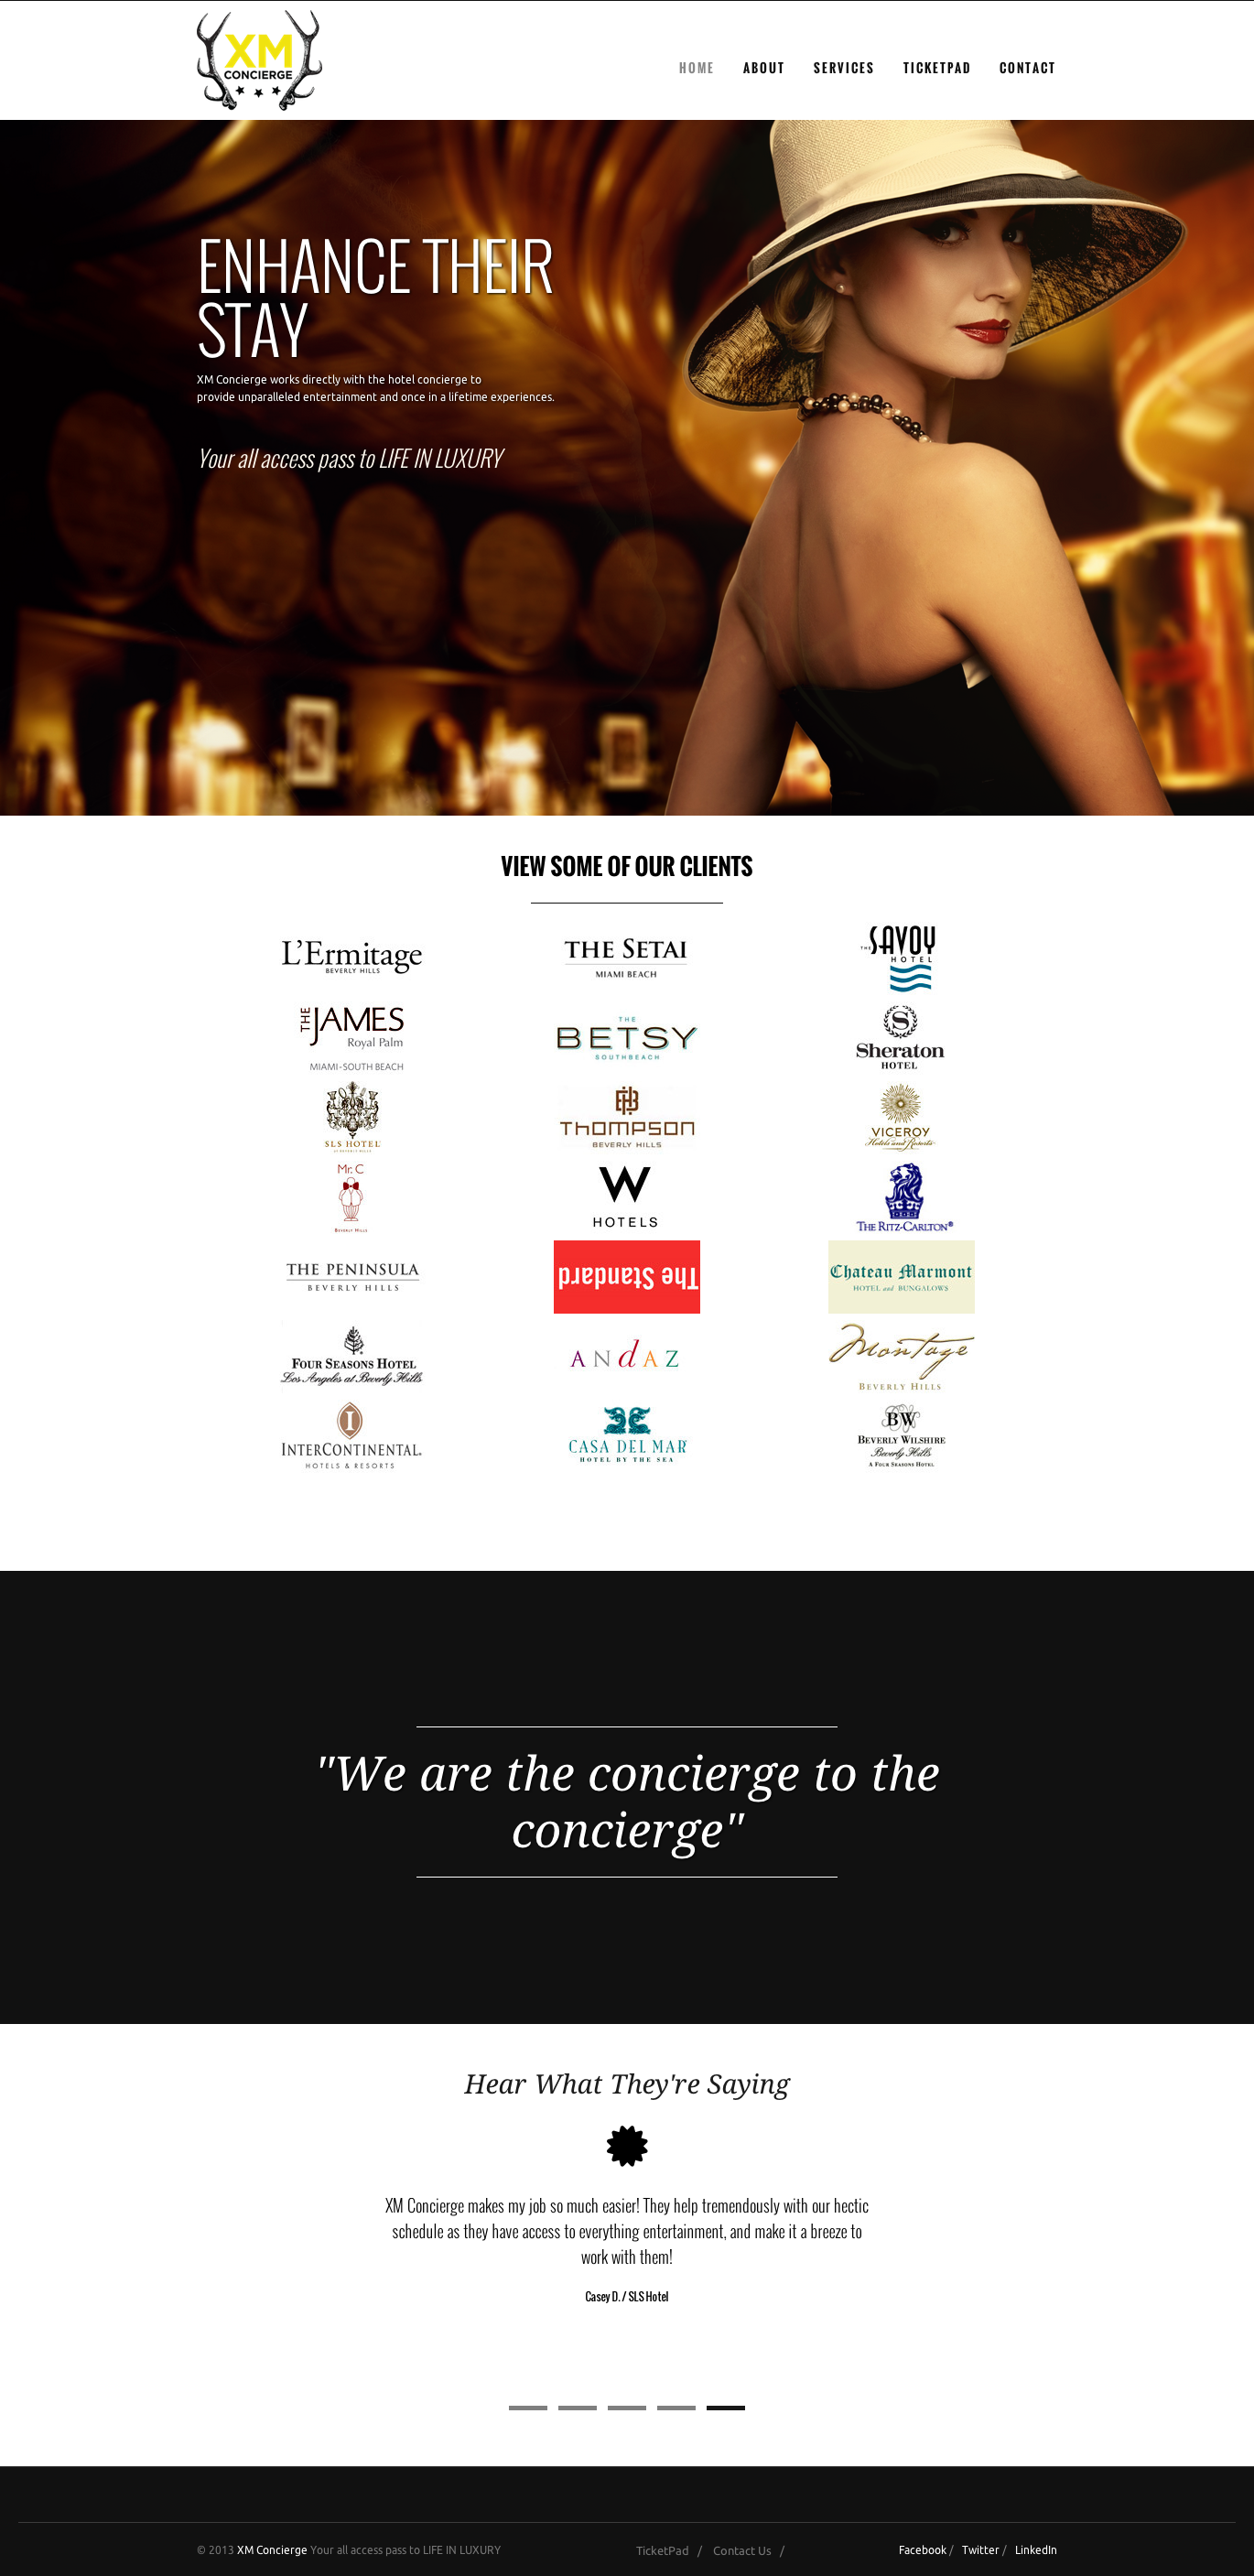 XM Concierge Homepage